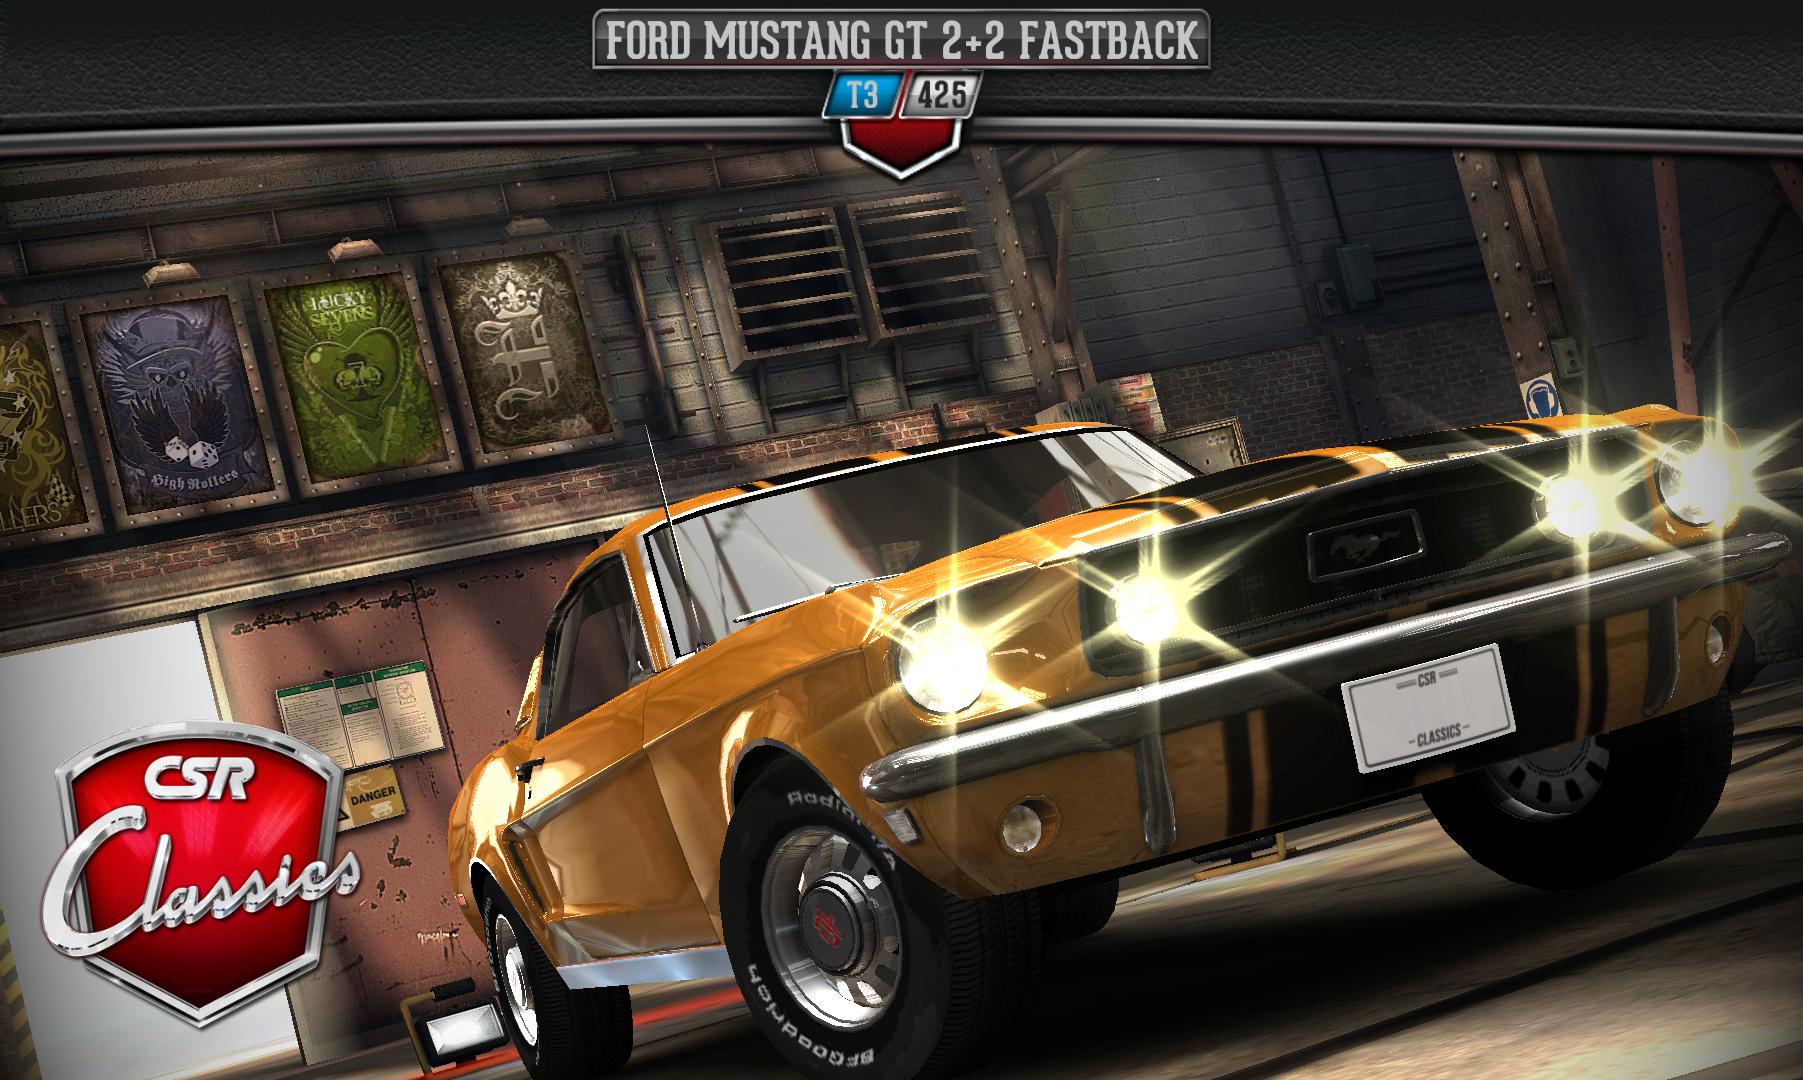 Ford Mustang Gt 2 2 Csr Classics Wiki Fandom Powered